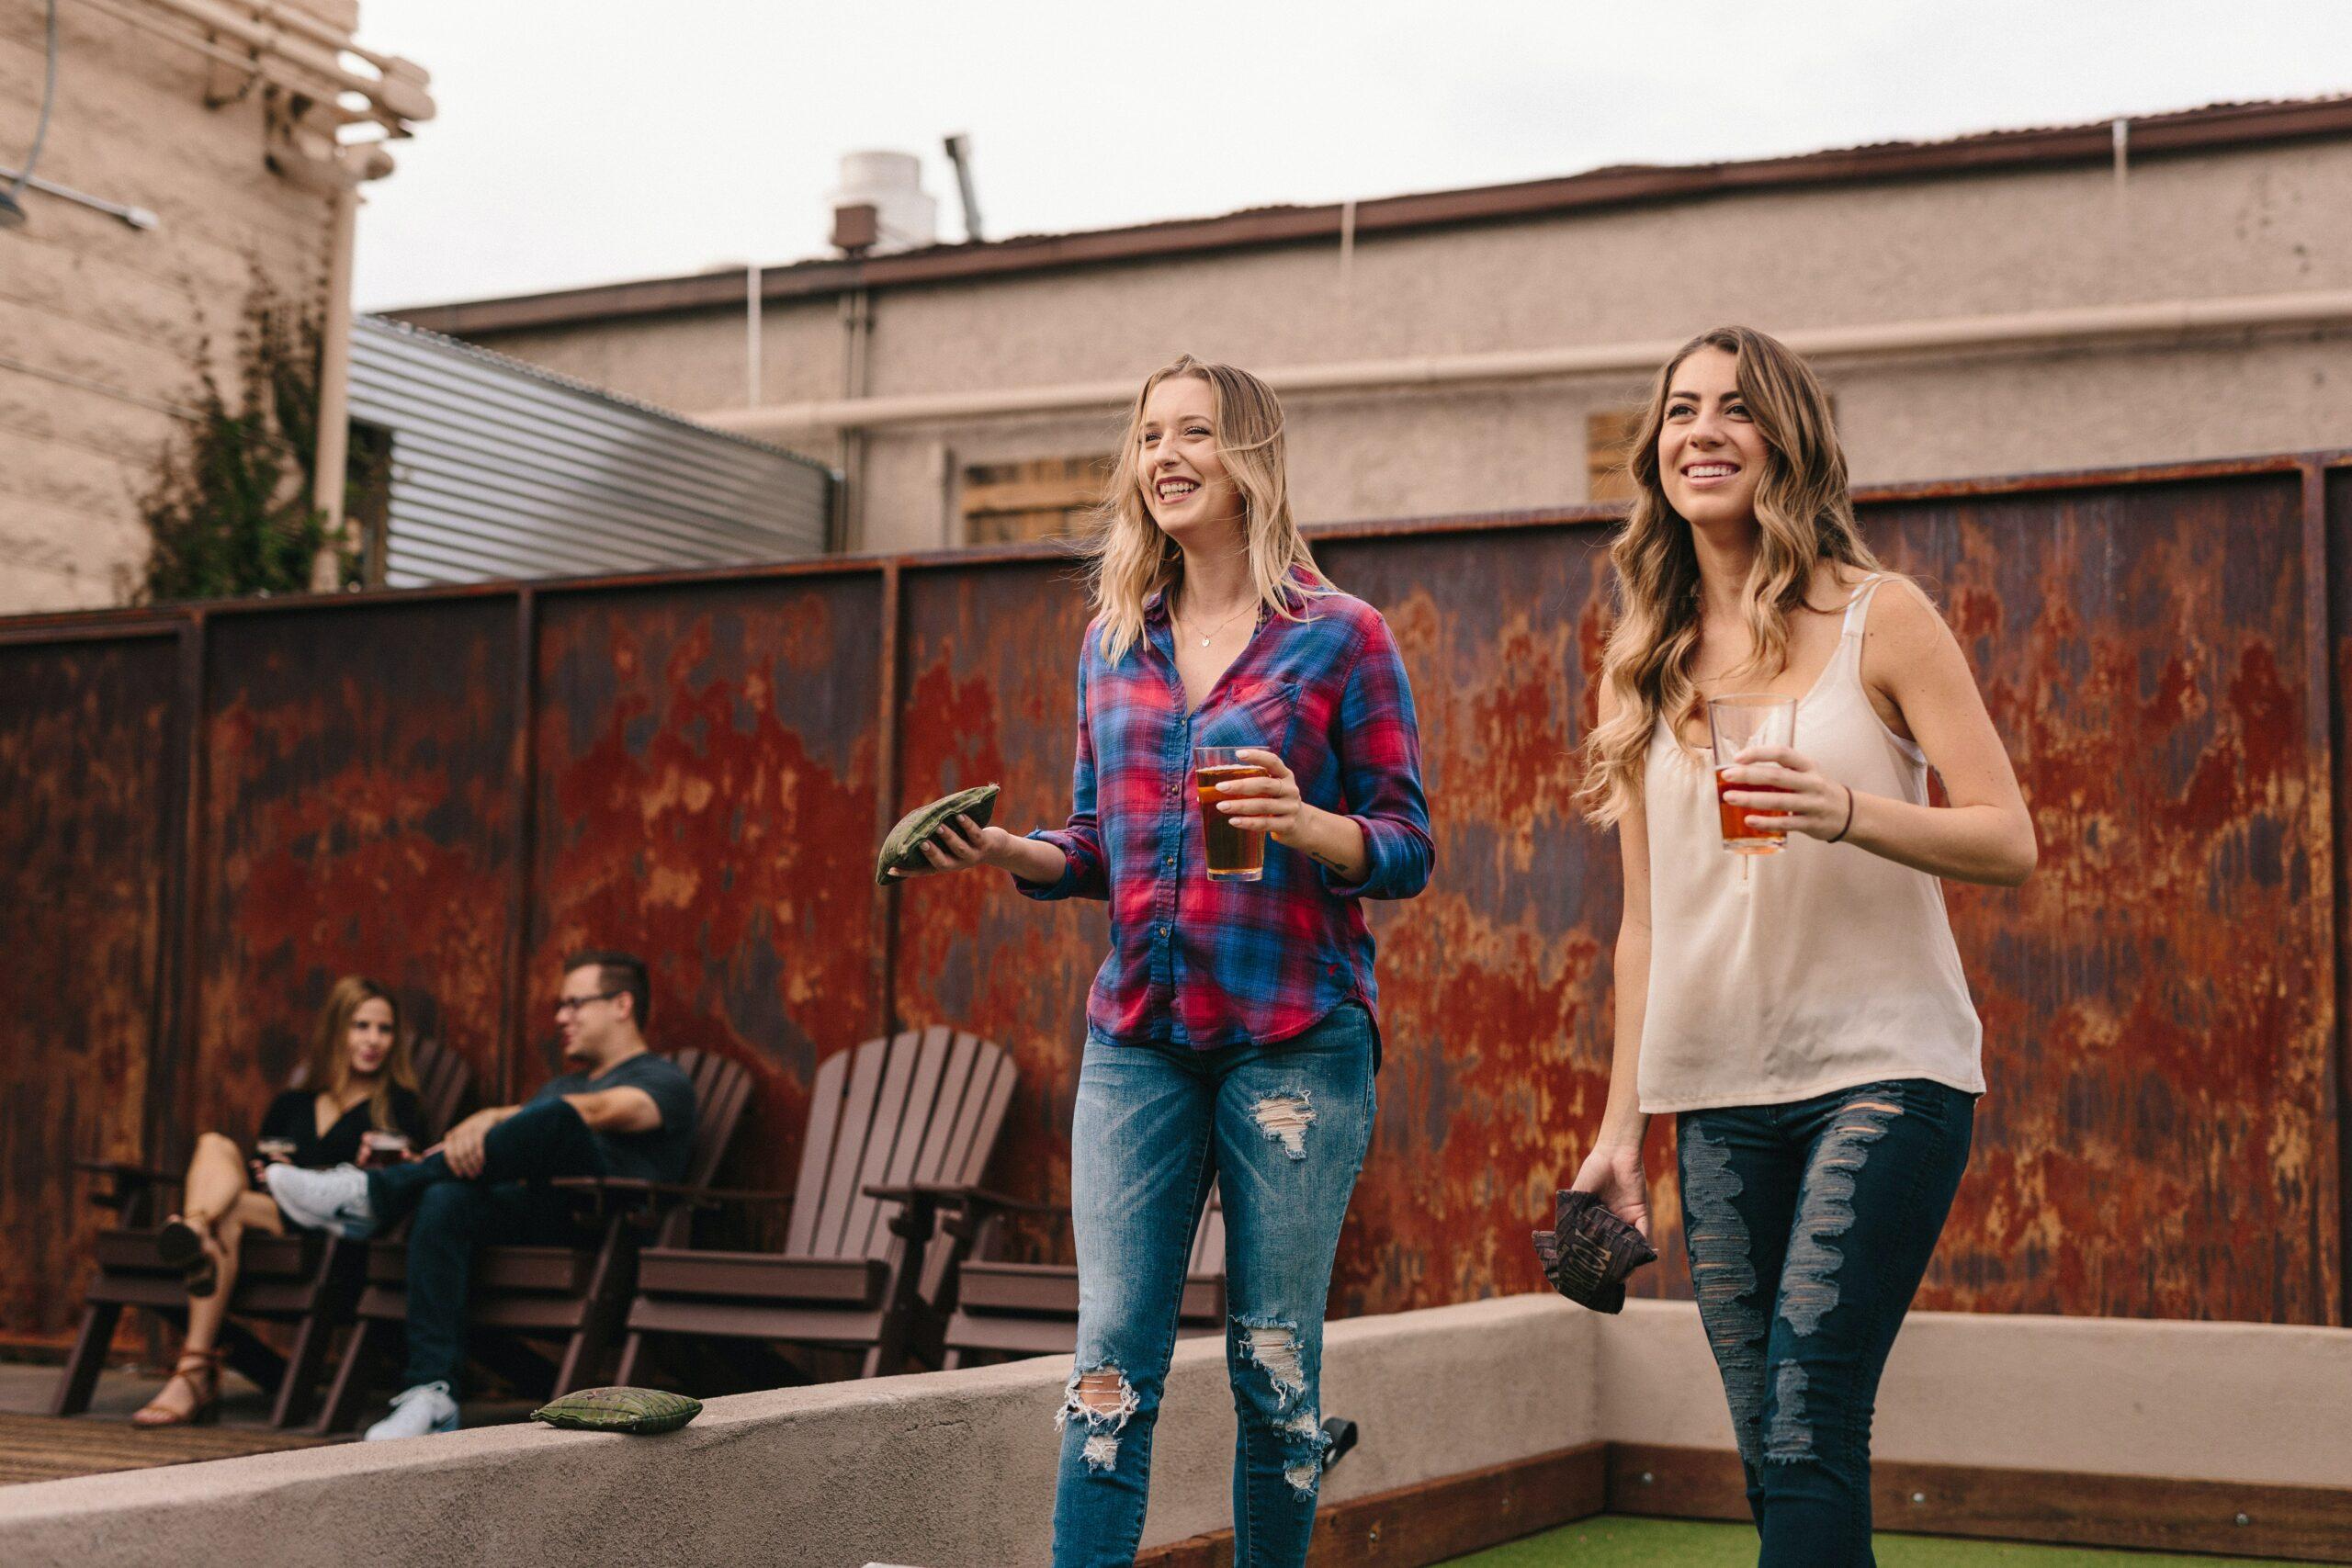 two white women playing cornhole on rooftop bar